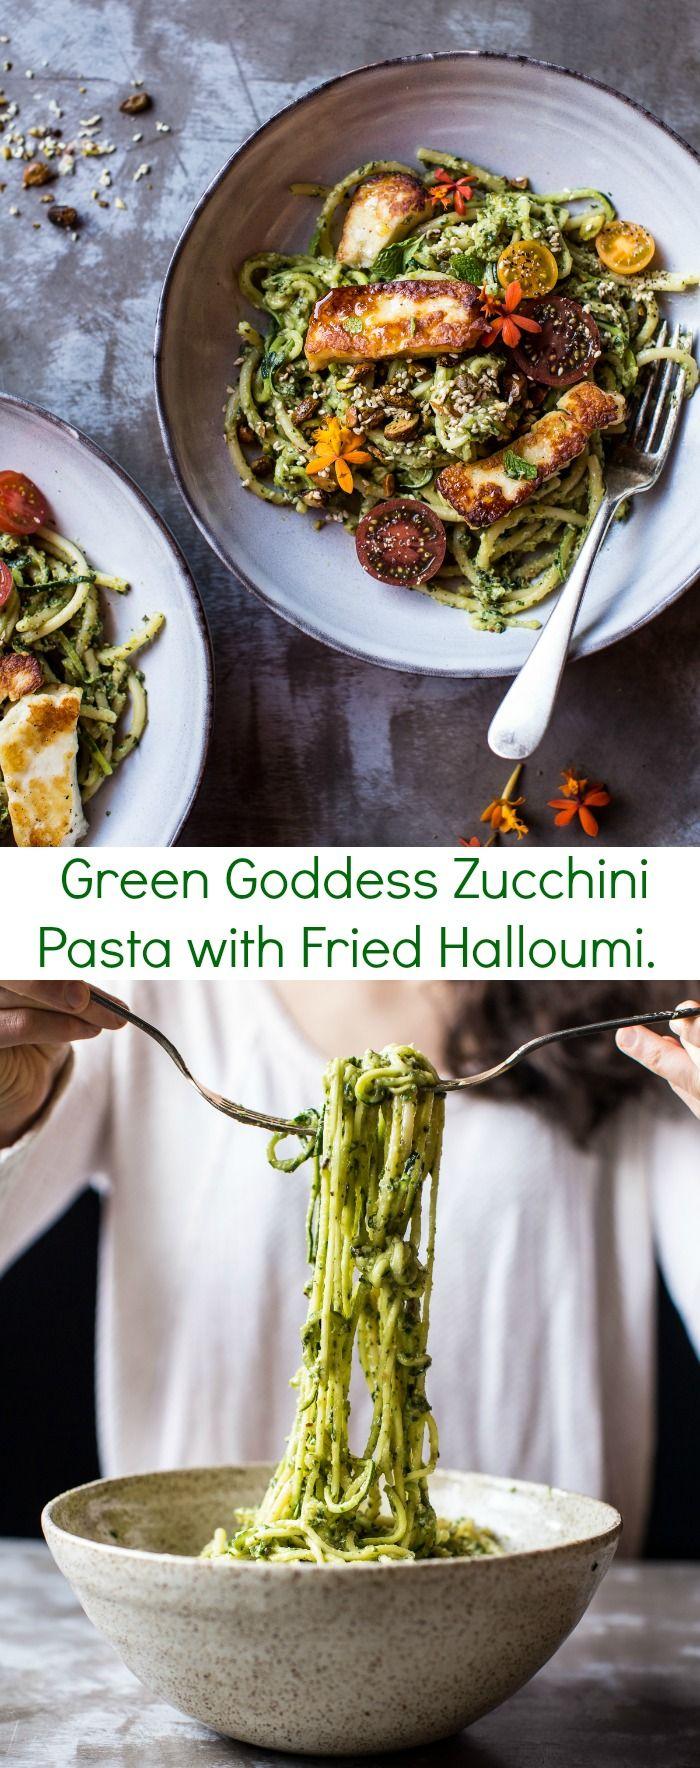 Green Goddess Zucchini Pasta with Fried Halloumi | halfbakedharvest.com @hbharvest. THAT AVOCADO PESTO